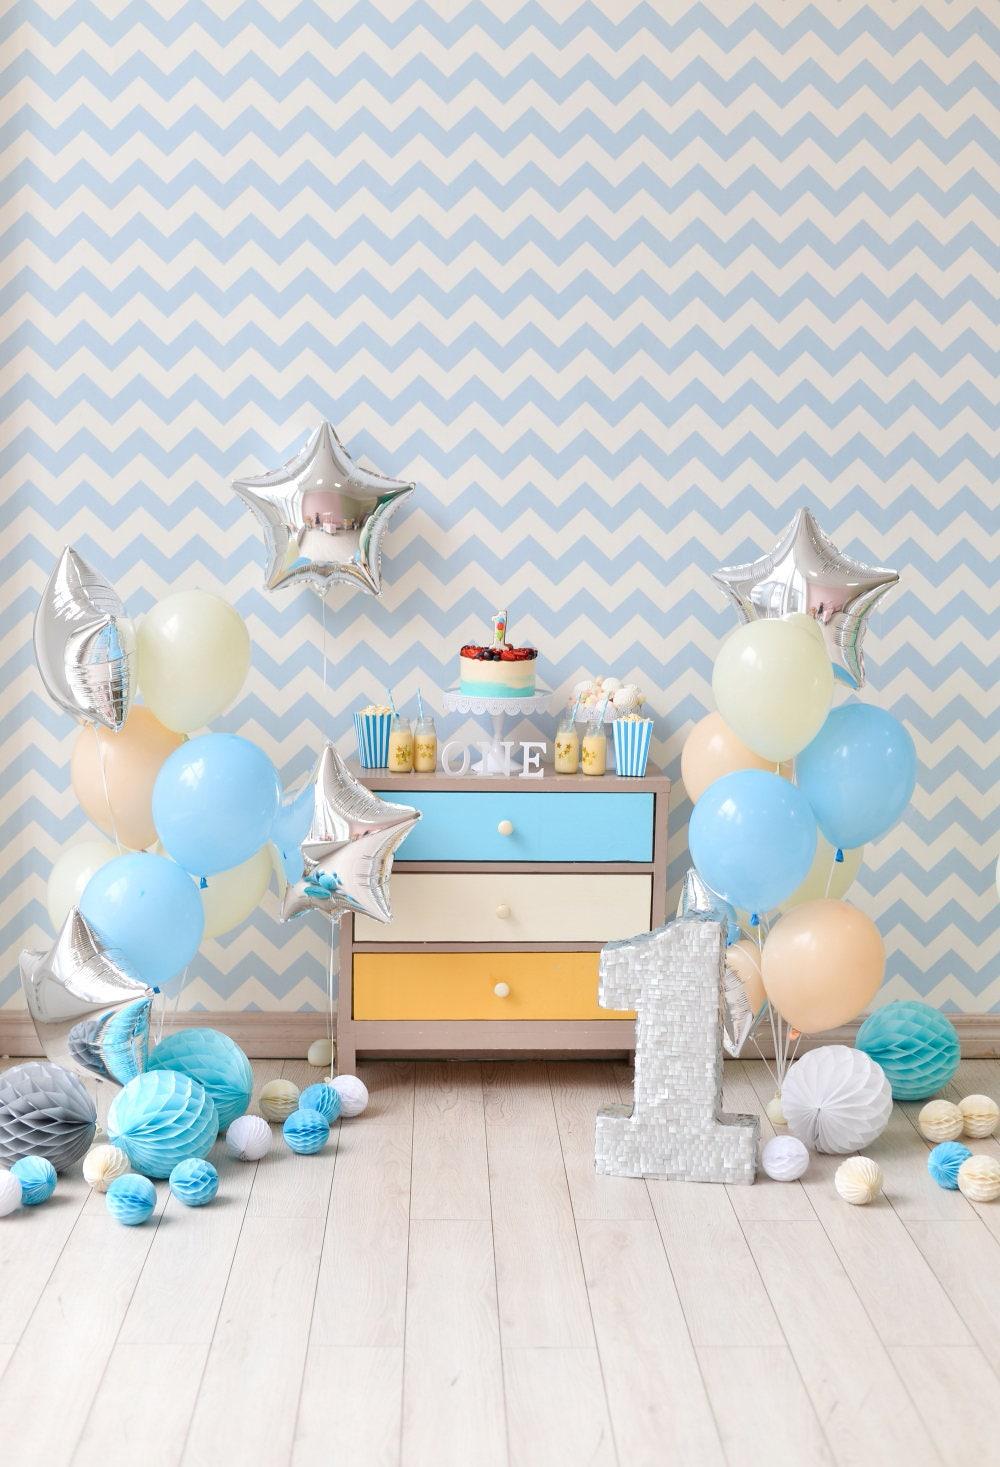 one year old baby shower birthday party photoshoot background | Etsy